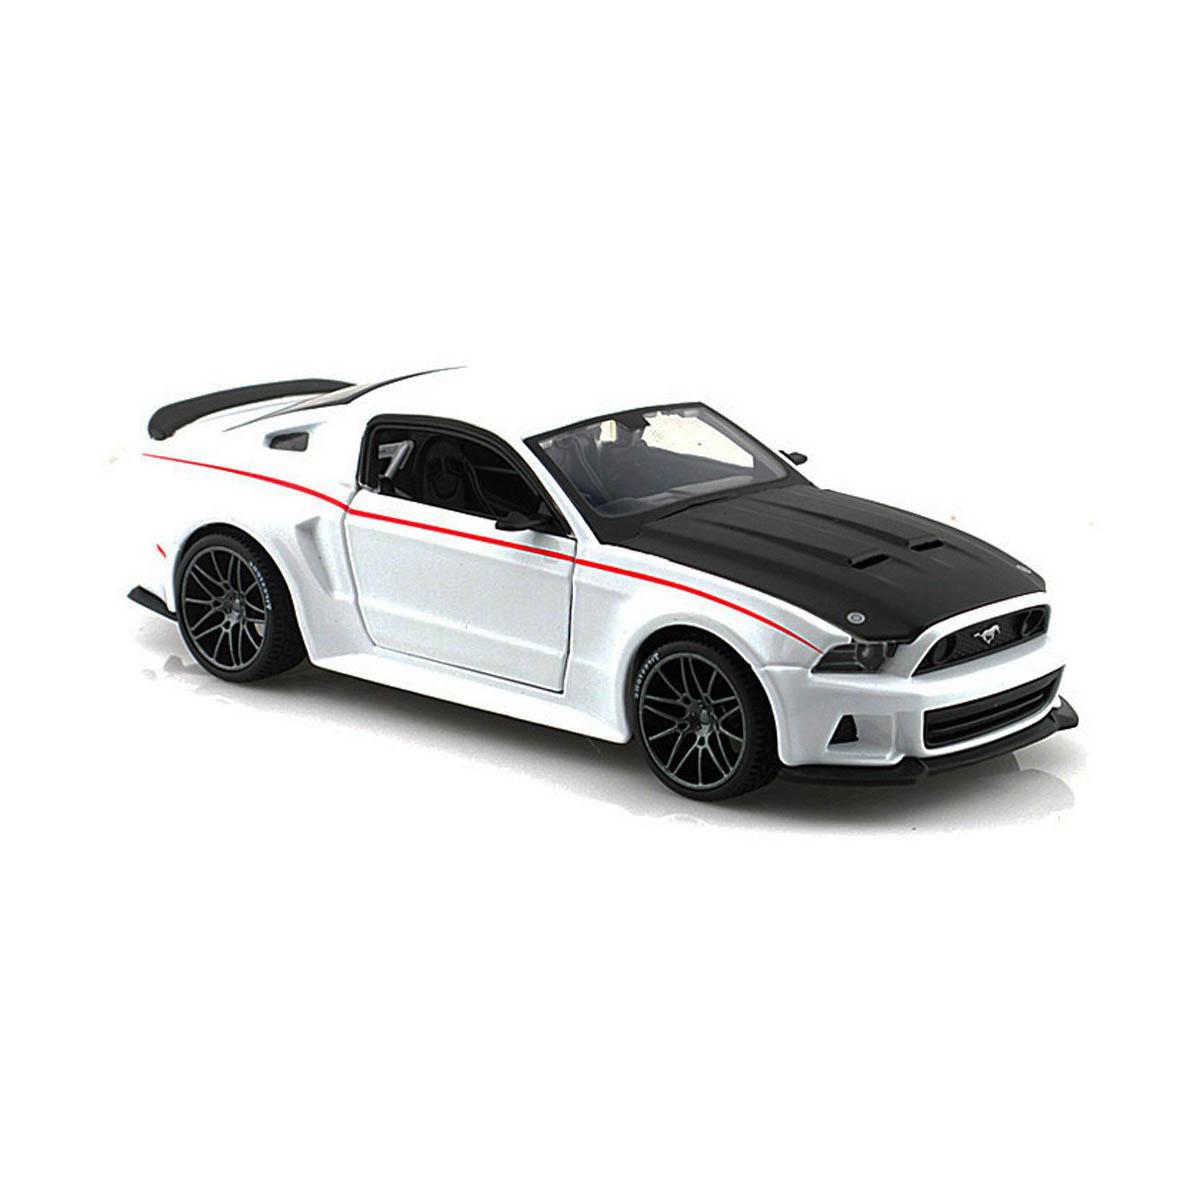 Masinuta Maisto Ford Mustang Street Racer 2014. 1:24. Alb